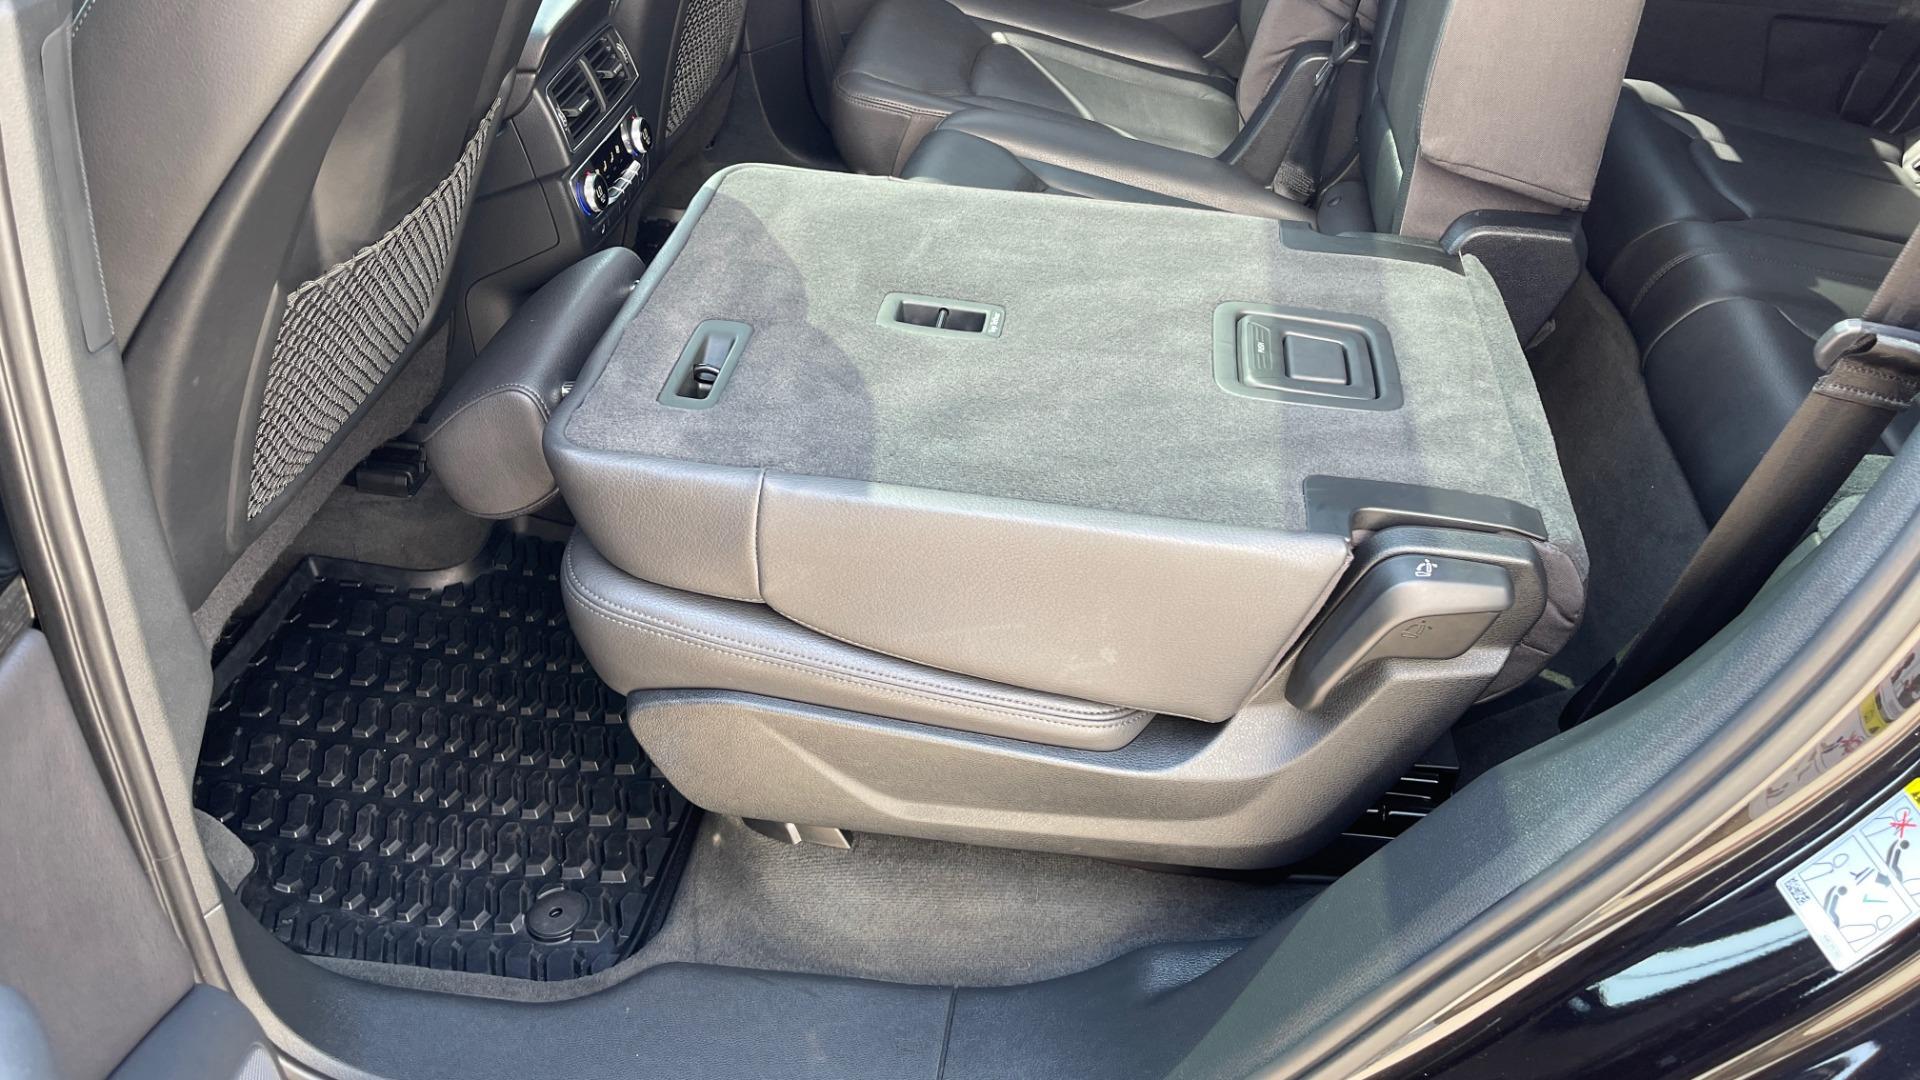 Used 2018 Audi Q7 PRESTIGE TIPTRONIC / NAV / SUNROOF / ADAPTIVE PKG / DRVR ASST / CLD WTHR /  for sale $49,995 at Formula Imports in Charlotte NC 28227 65